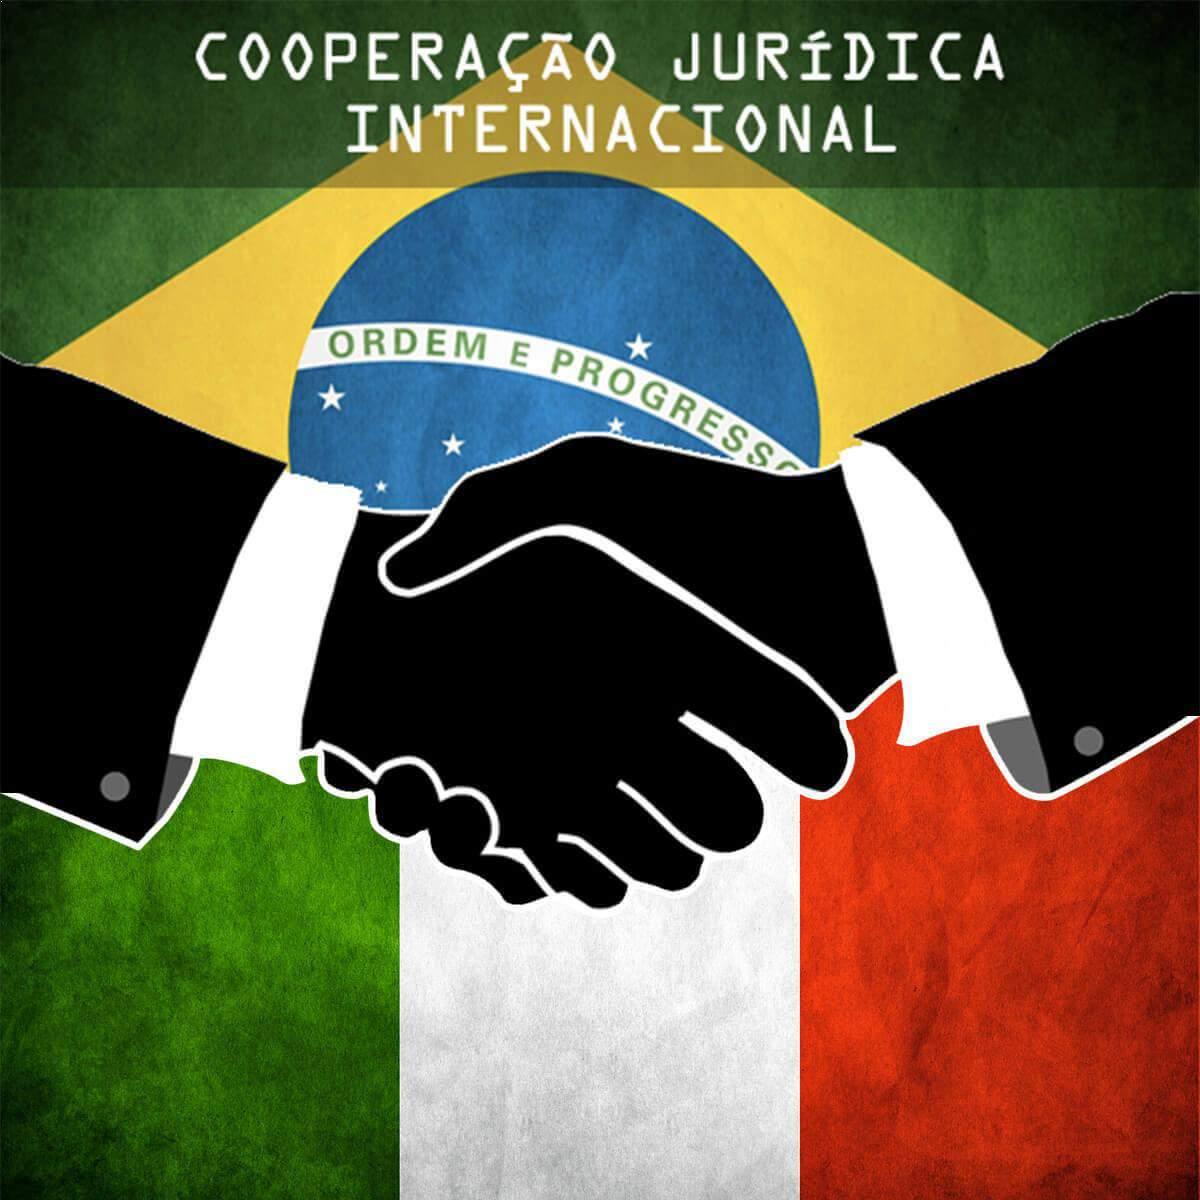 Cooperacao Jurídica Internacional